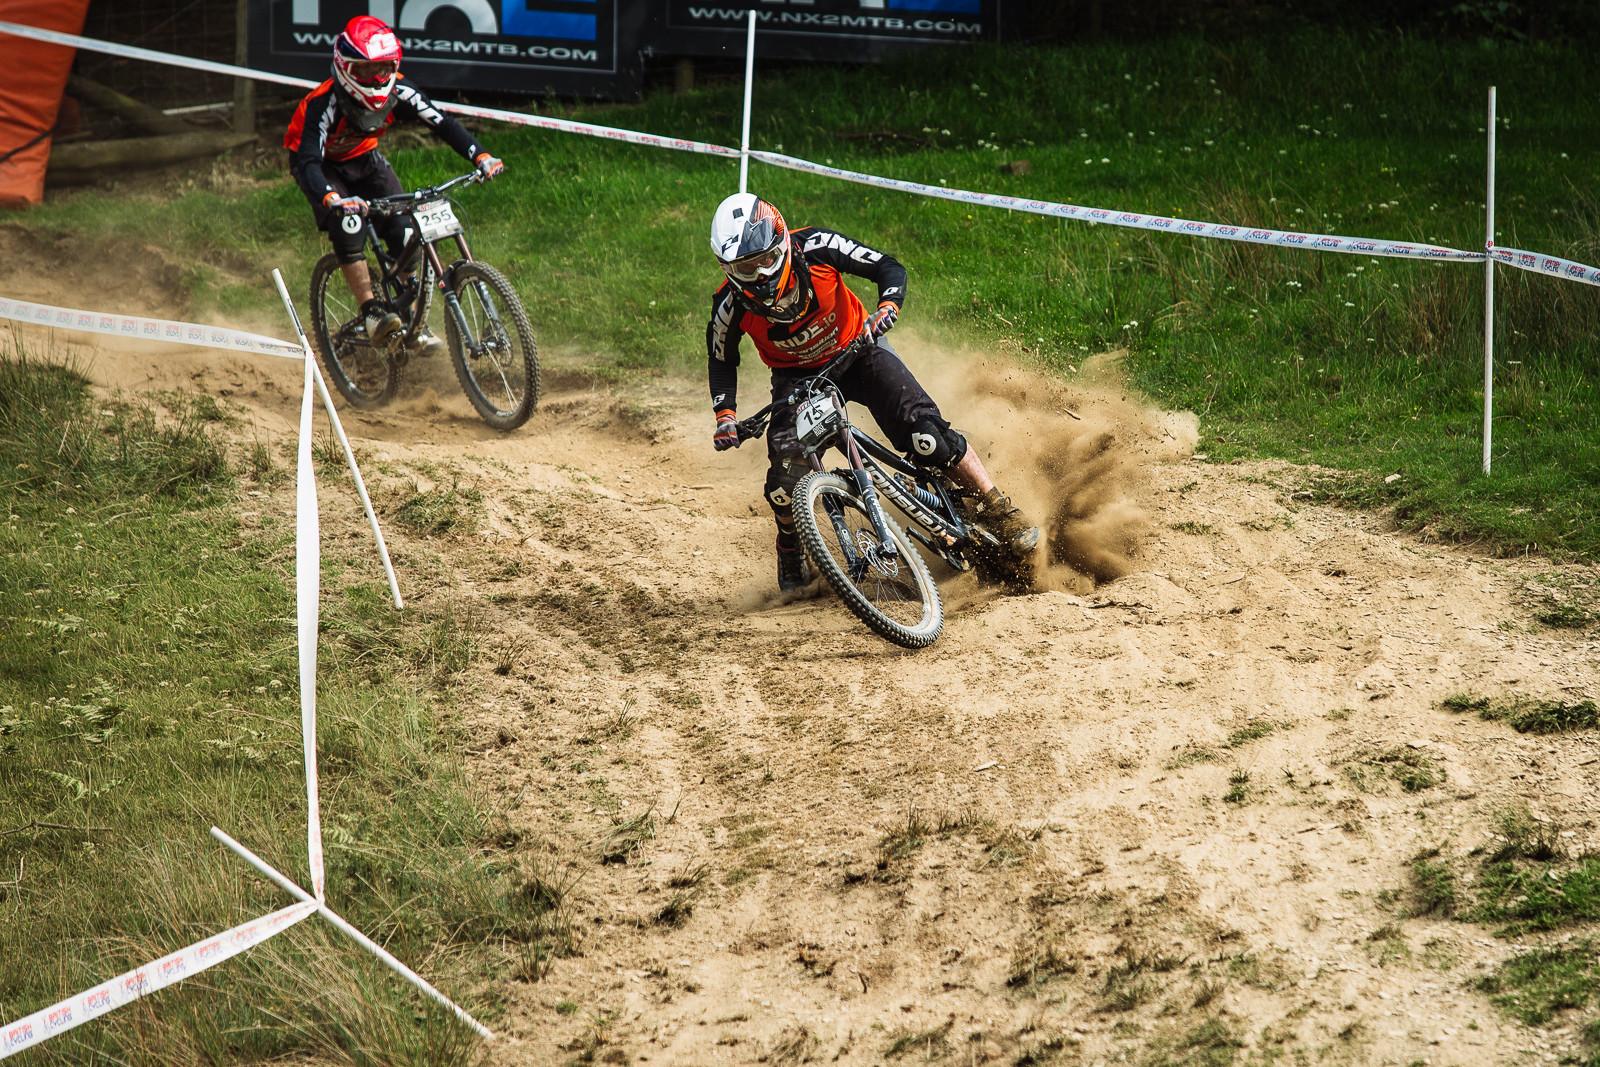 Emyr Davies, British DH Series, Bala - RACE REPORT - 2015 British Downhill Series Bala - Mountain Biking Pictures - Vital MTB